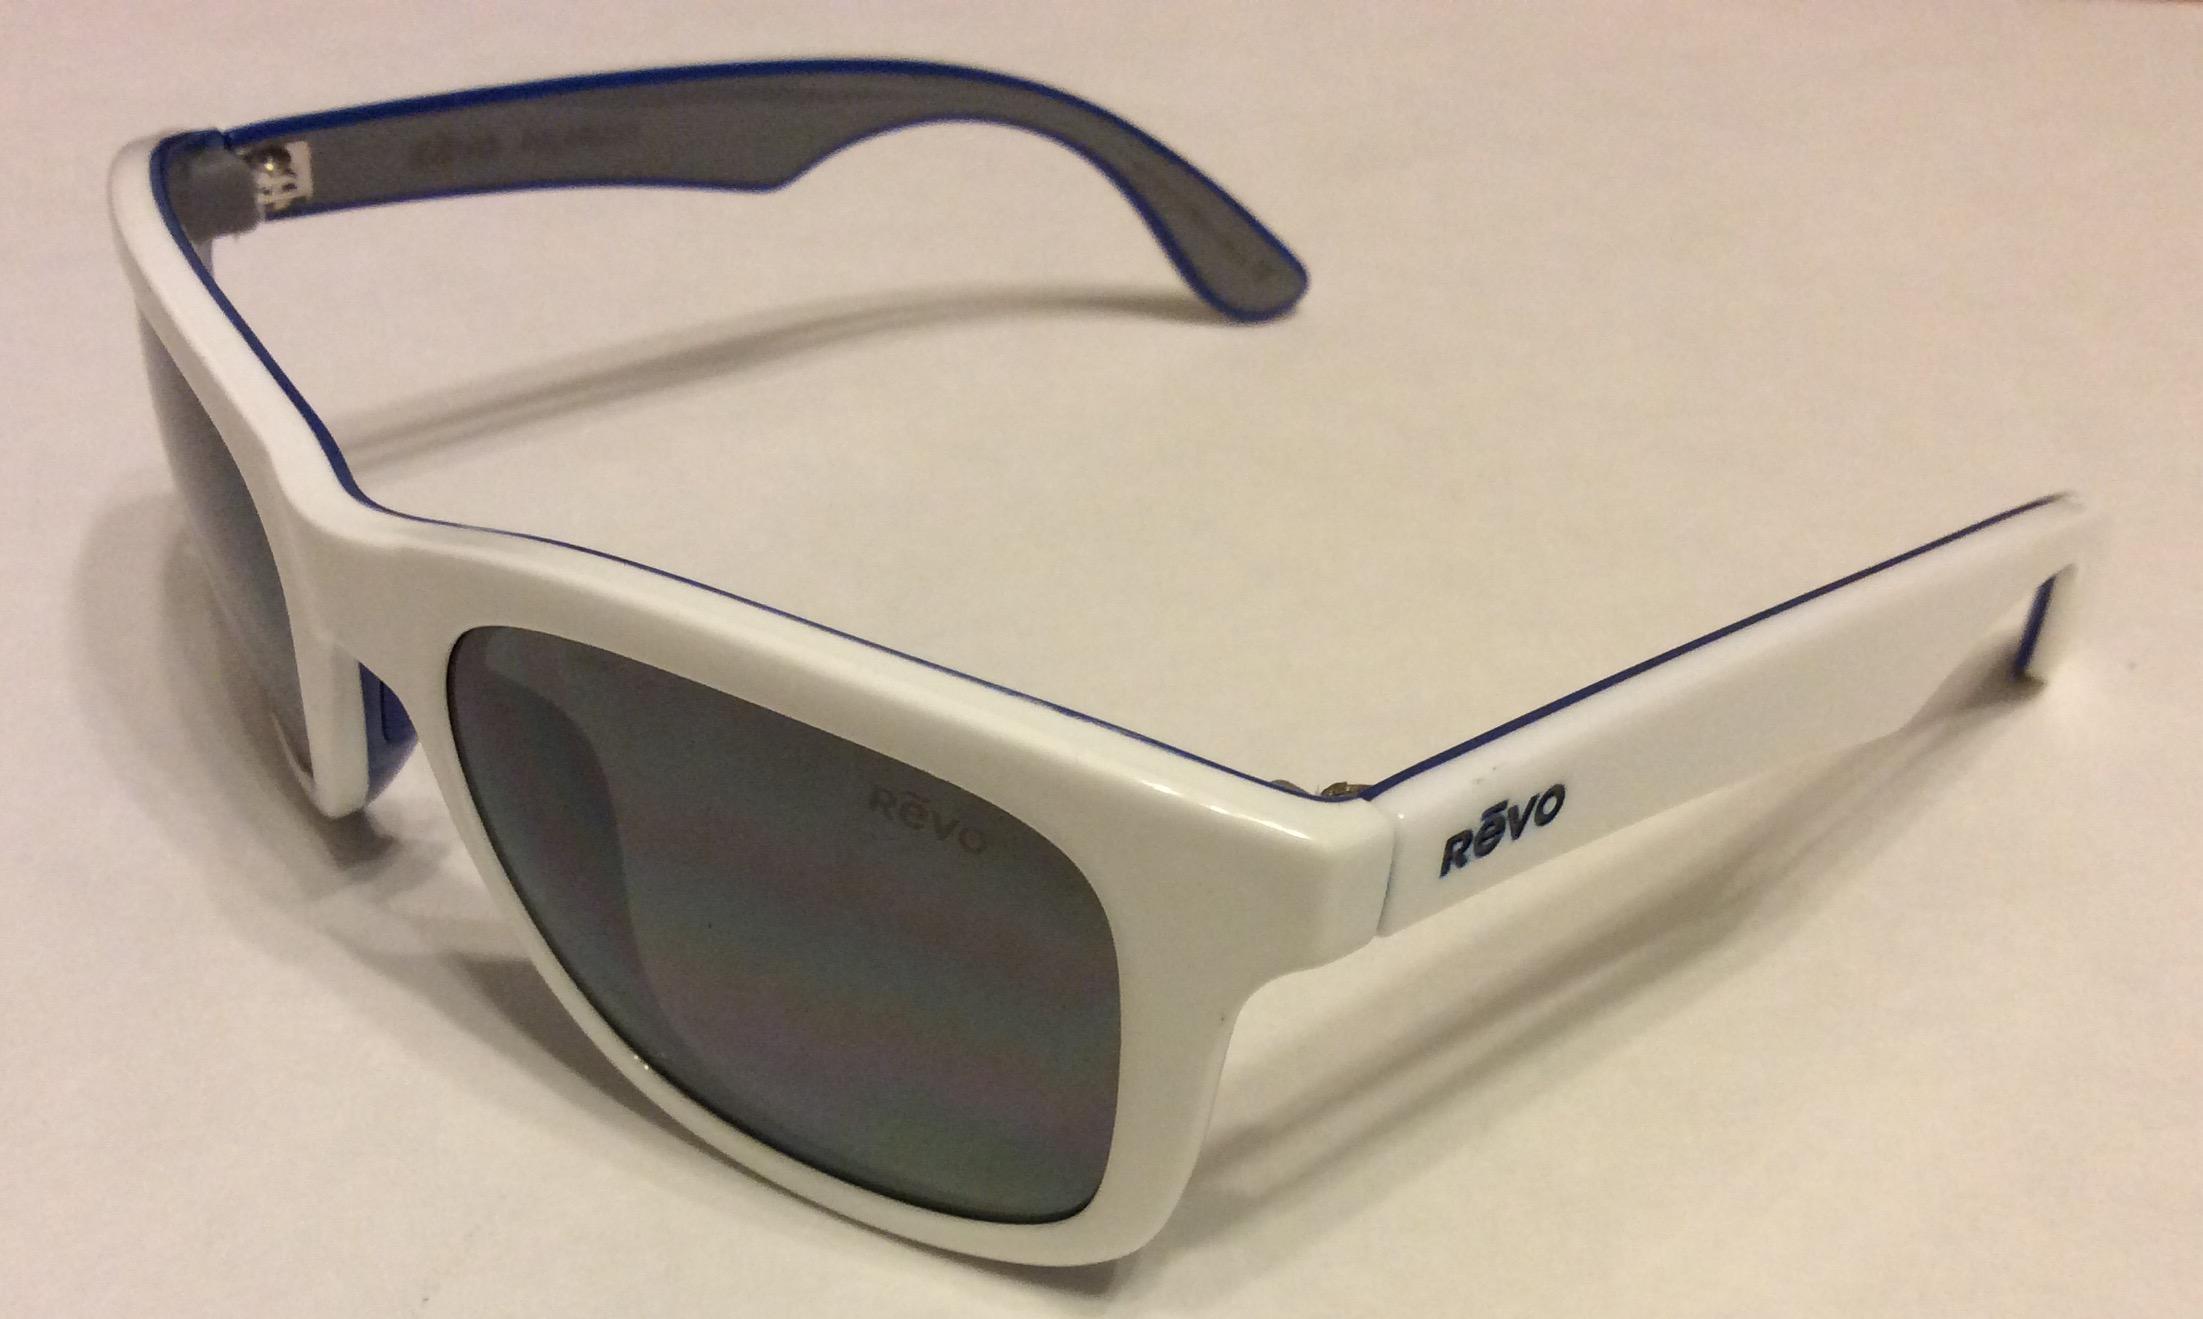 Revo Huddie Sunglasses - White Blue - POLARIZED Gray RE1000-09